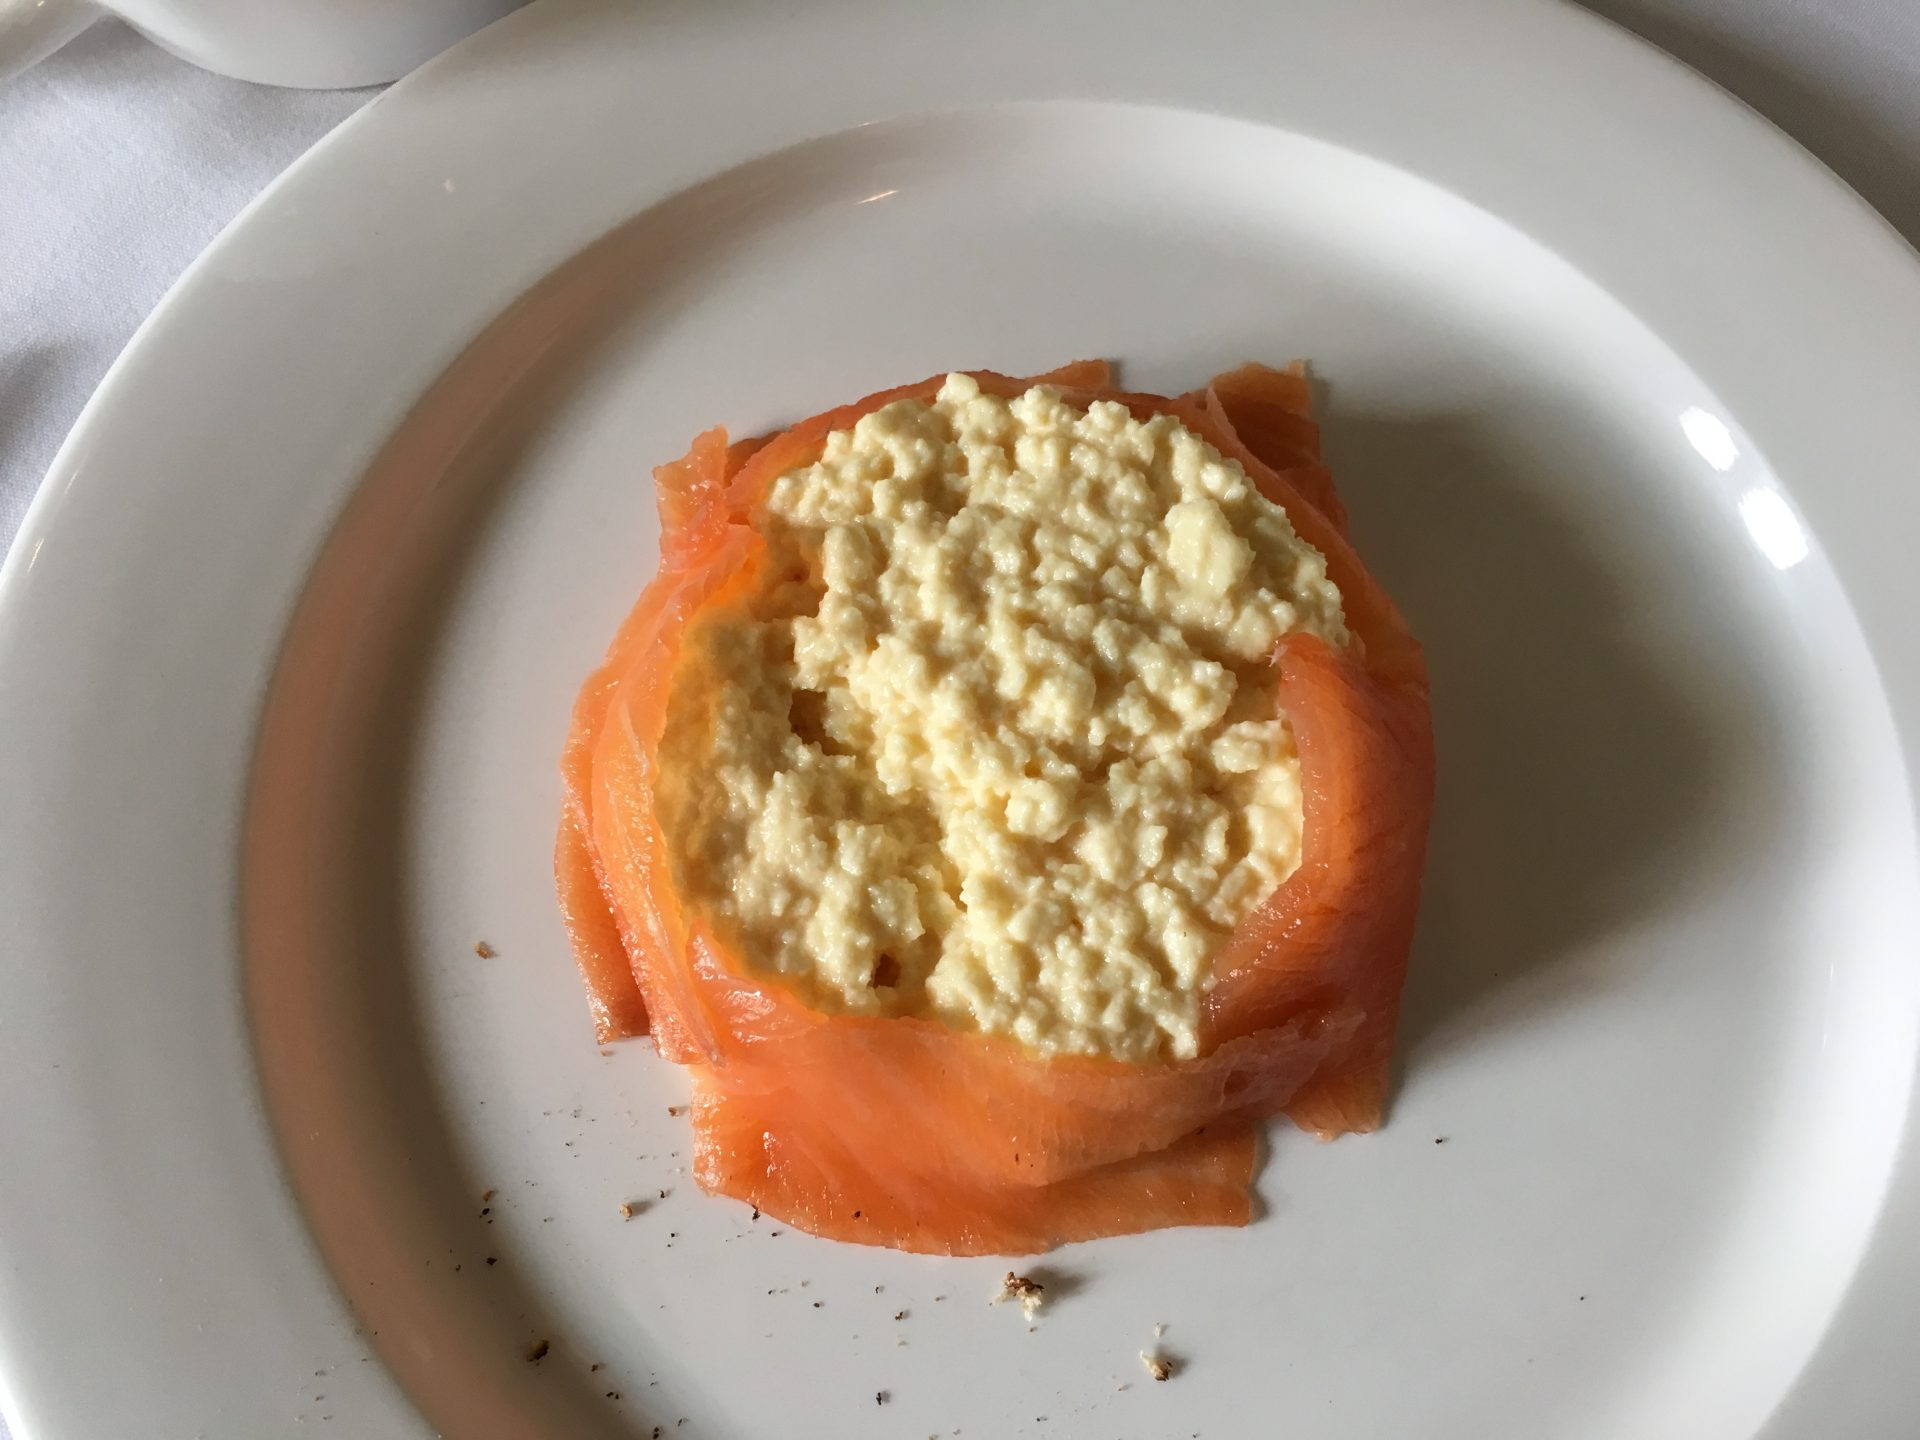 Ettington Park hotel breakfast - smoked salmon and scrambled egg